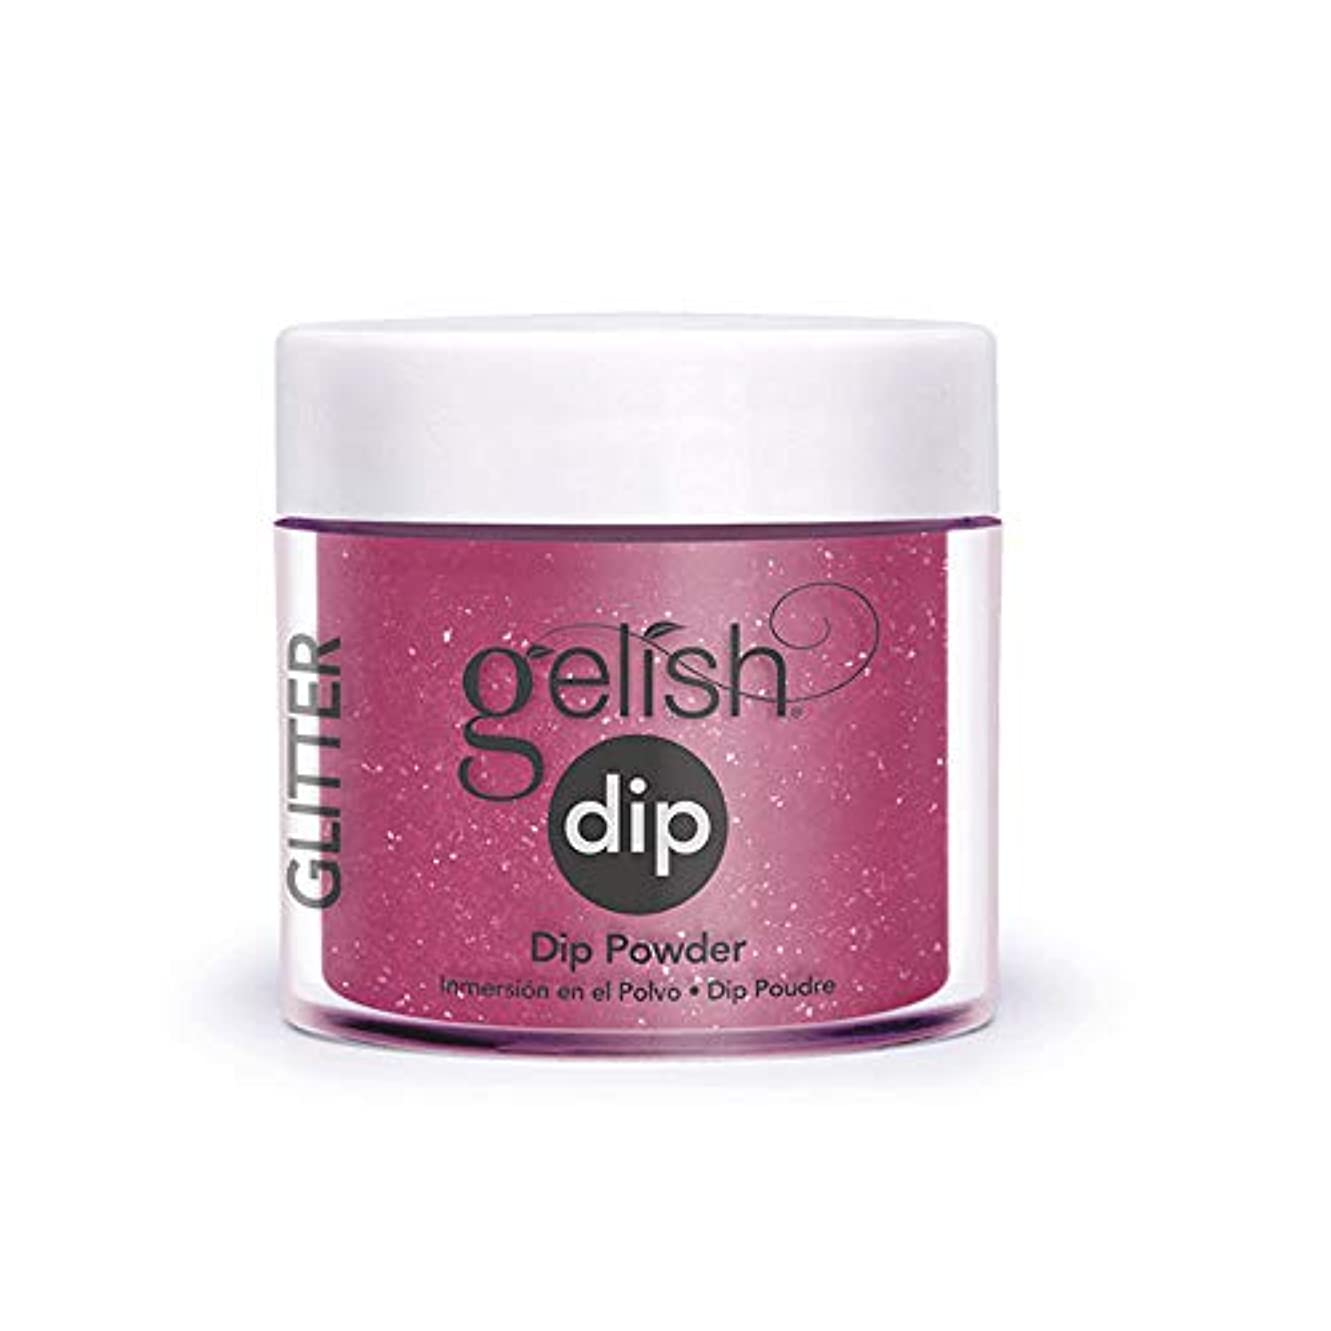 装置戦艦想像力Harmony Gelish - Acrylic Dip Powder - High Voltage - 23g / 0.8oz